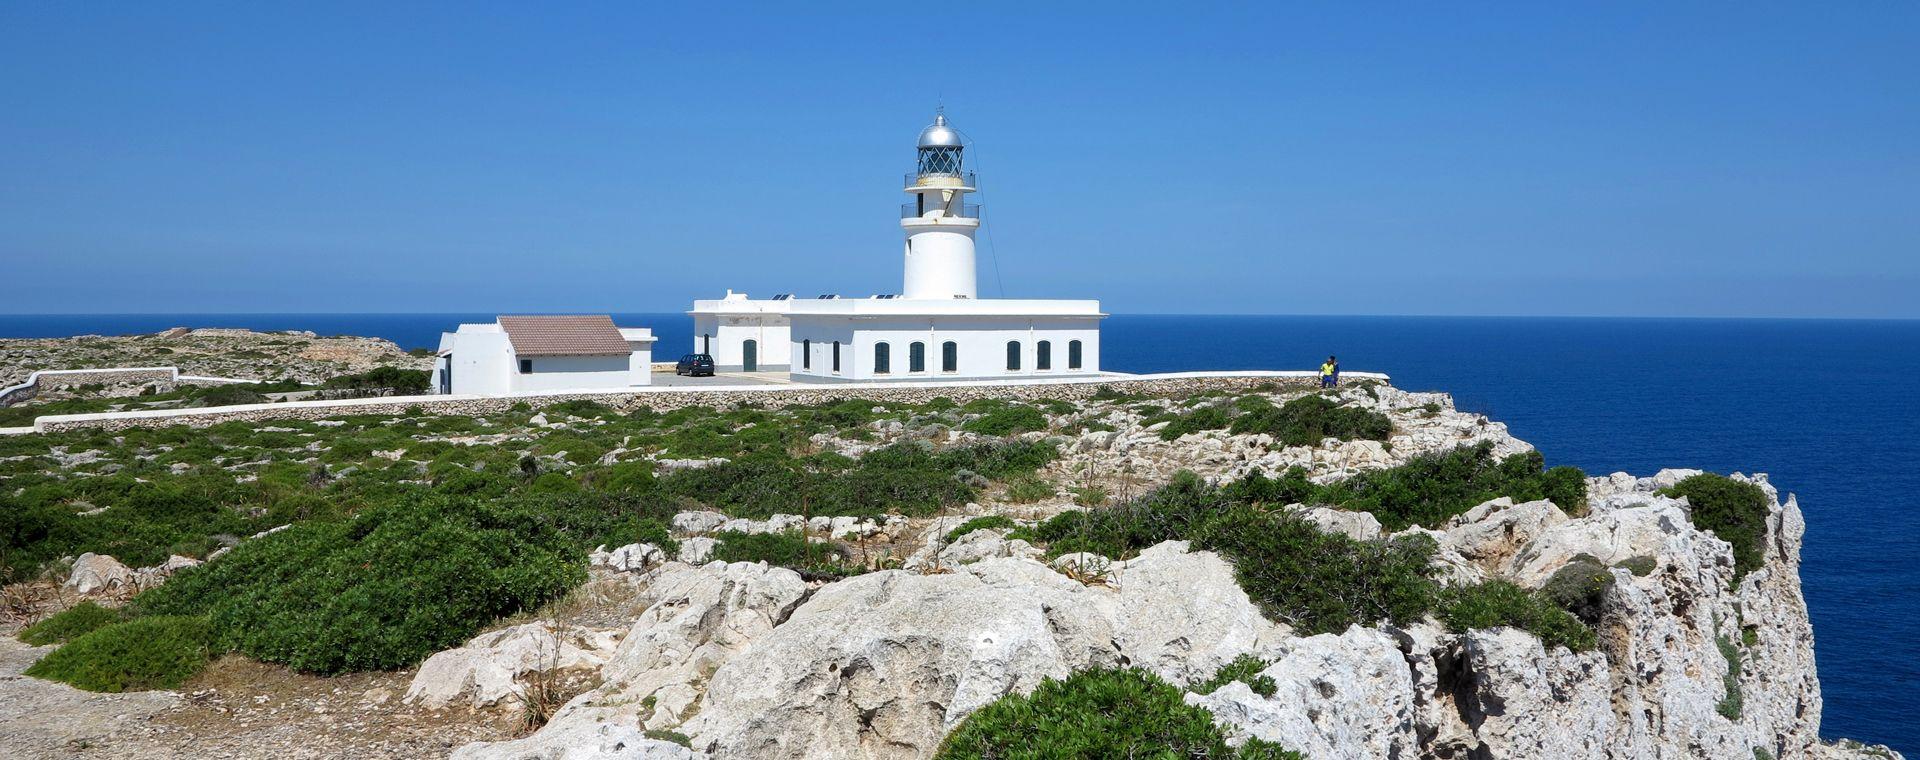 Image Baléares : île de Minorque